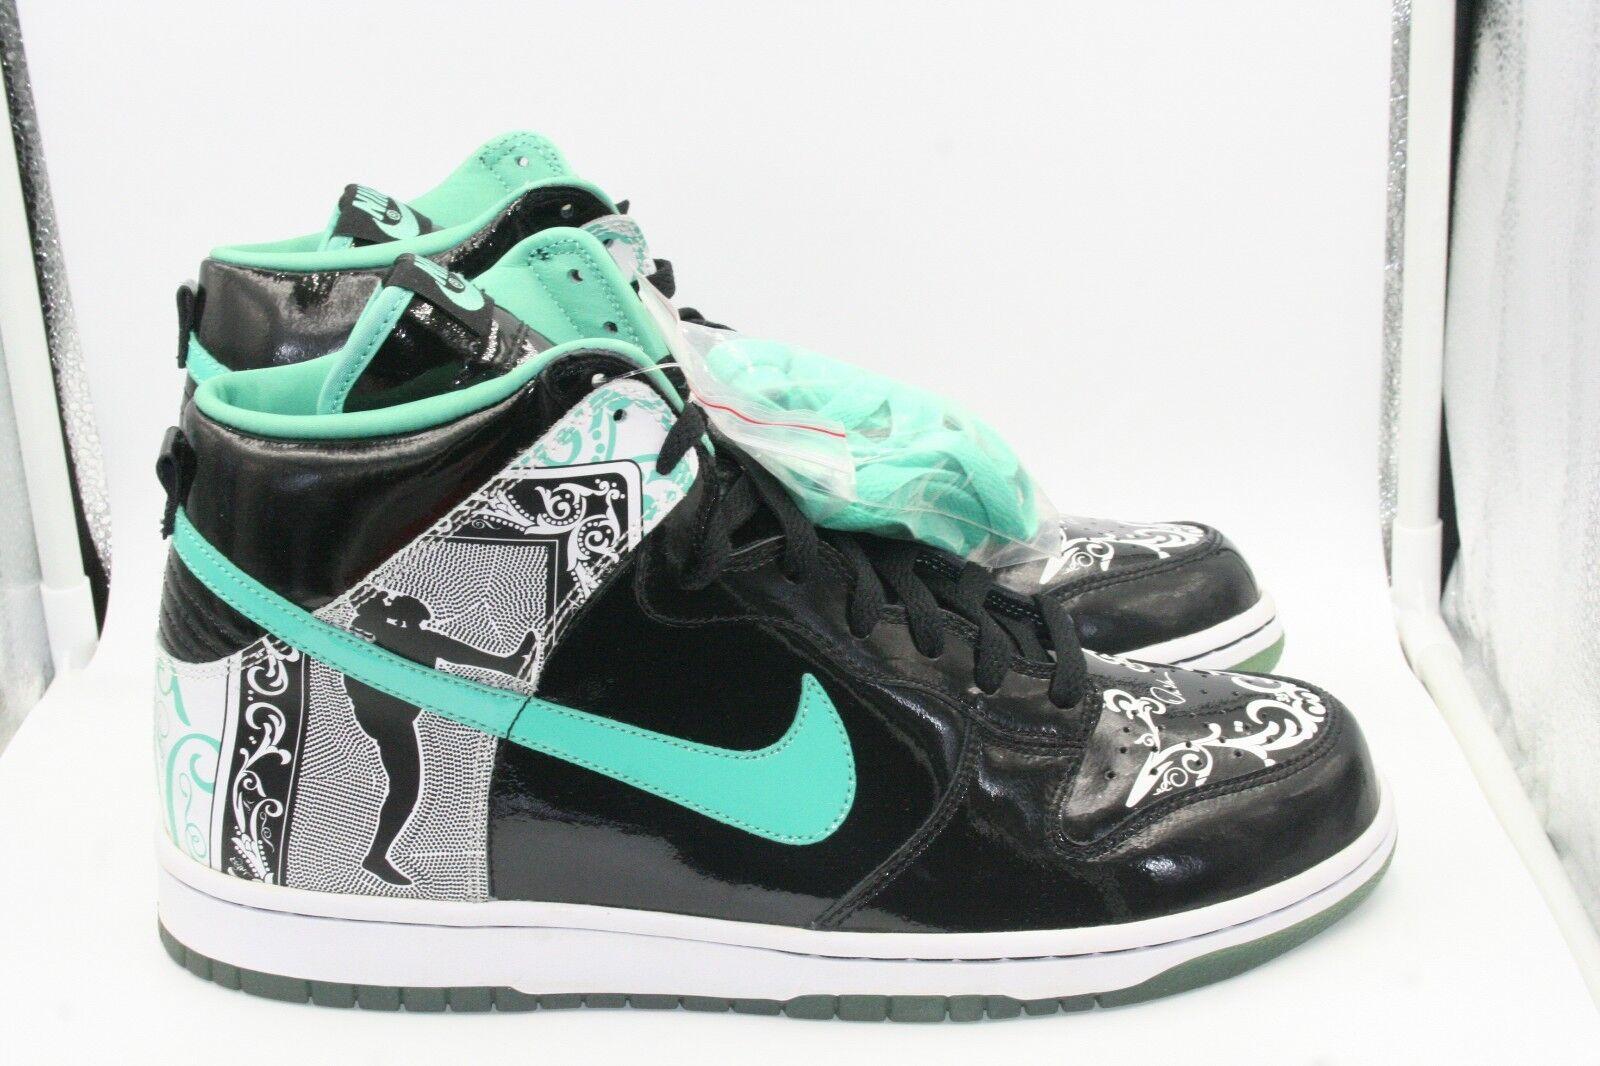 Nike Dunk High Dontrelle SZ 11 DS Florida Marlins Black Azure Teal Willis